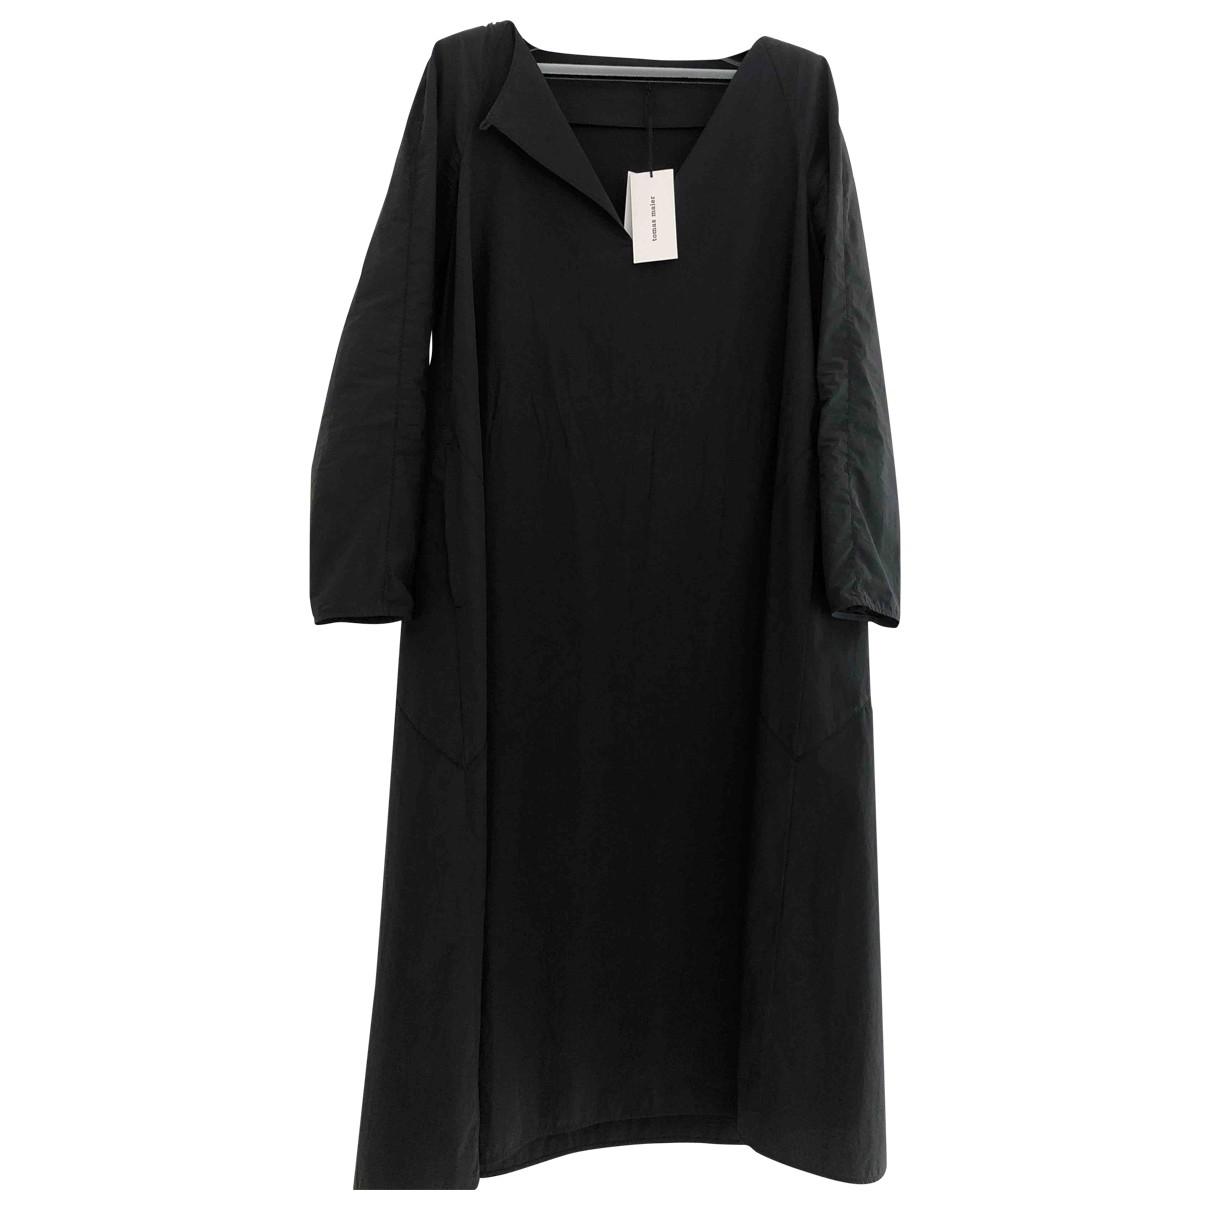 Tomas Maier \N Kleid in  Schwarz Baumwolle